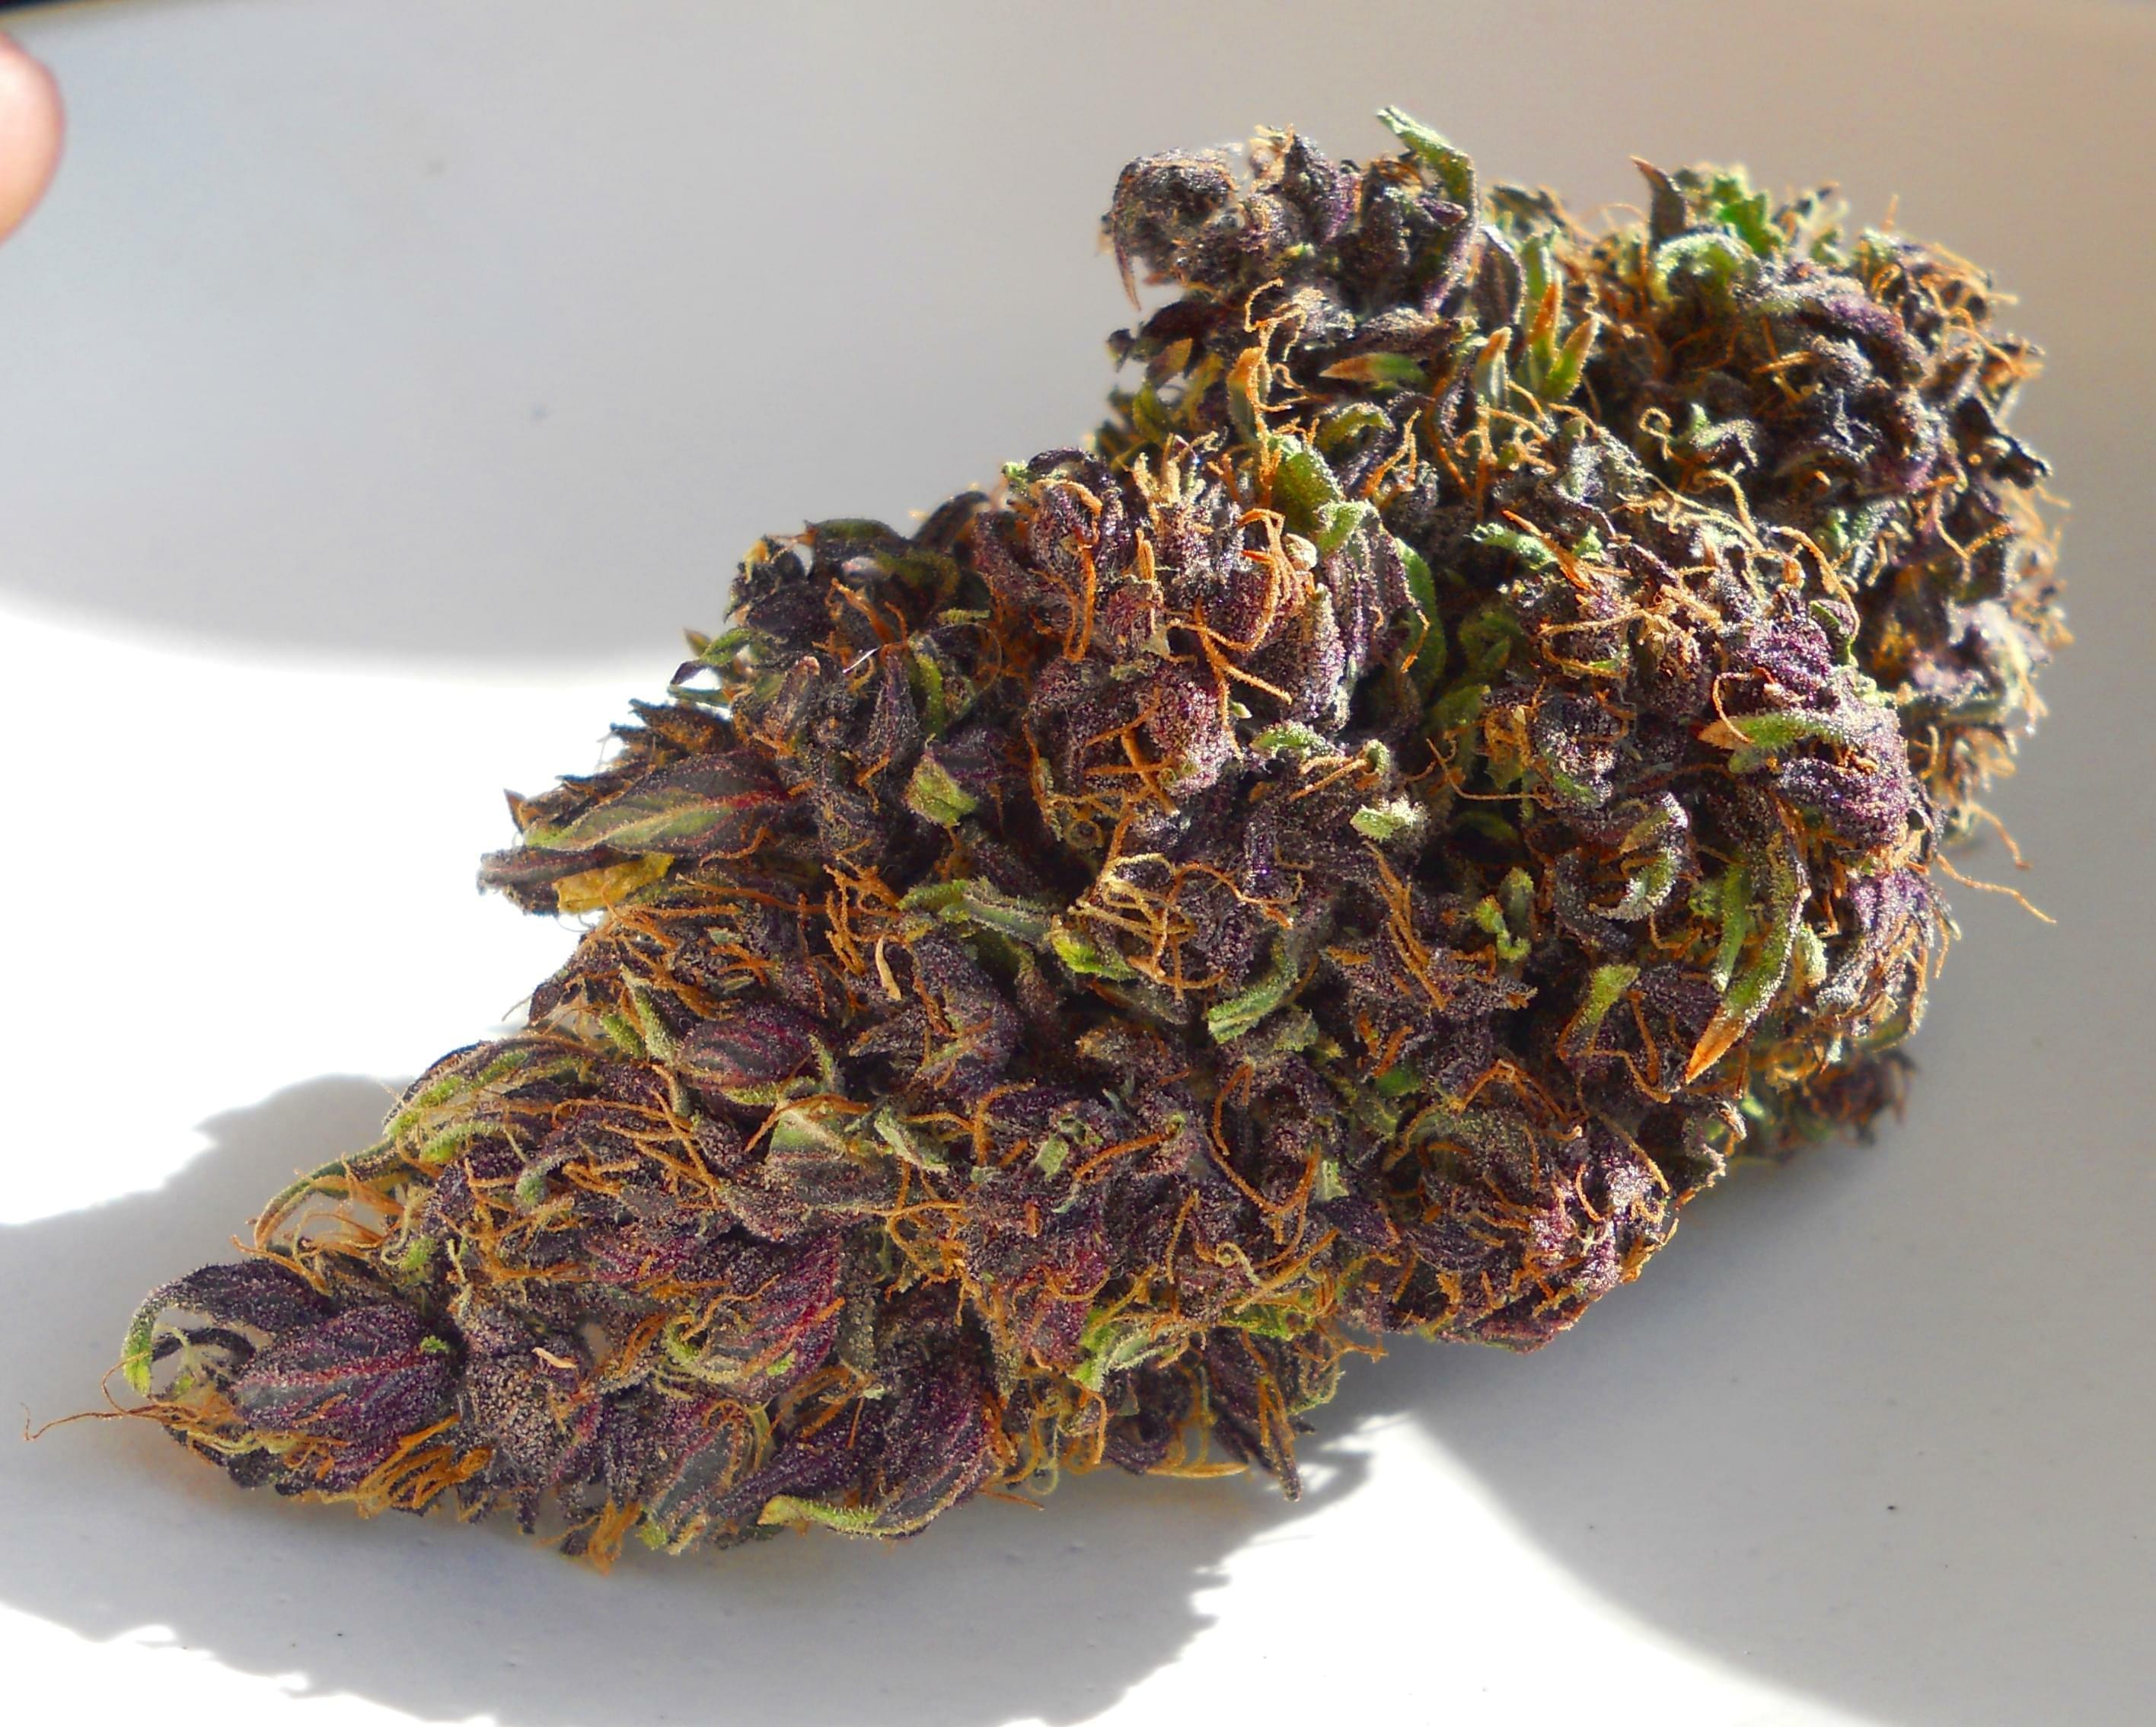 Organically Your S Photos Palmdale Marijuana Delivery